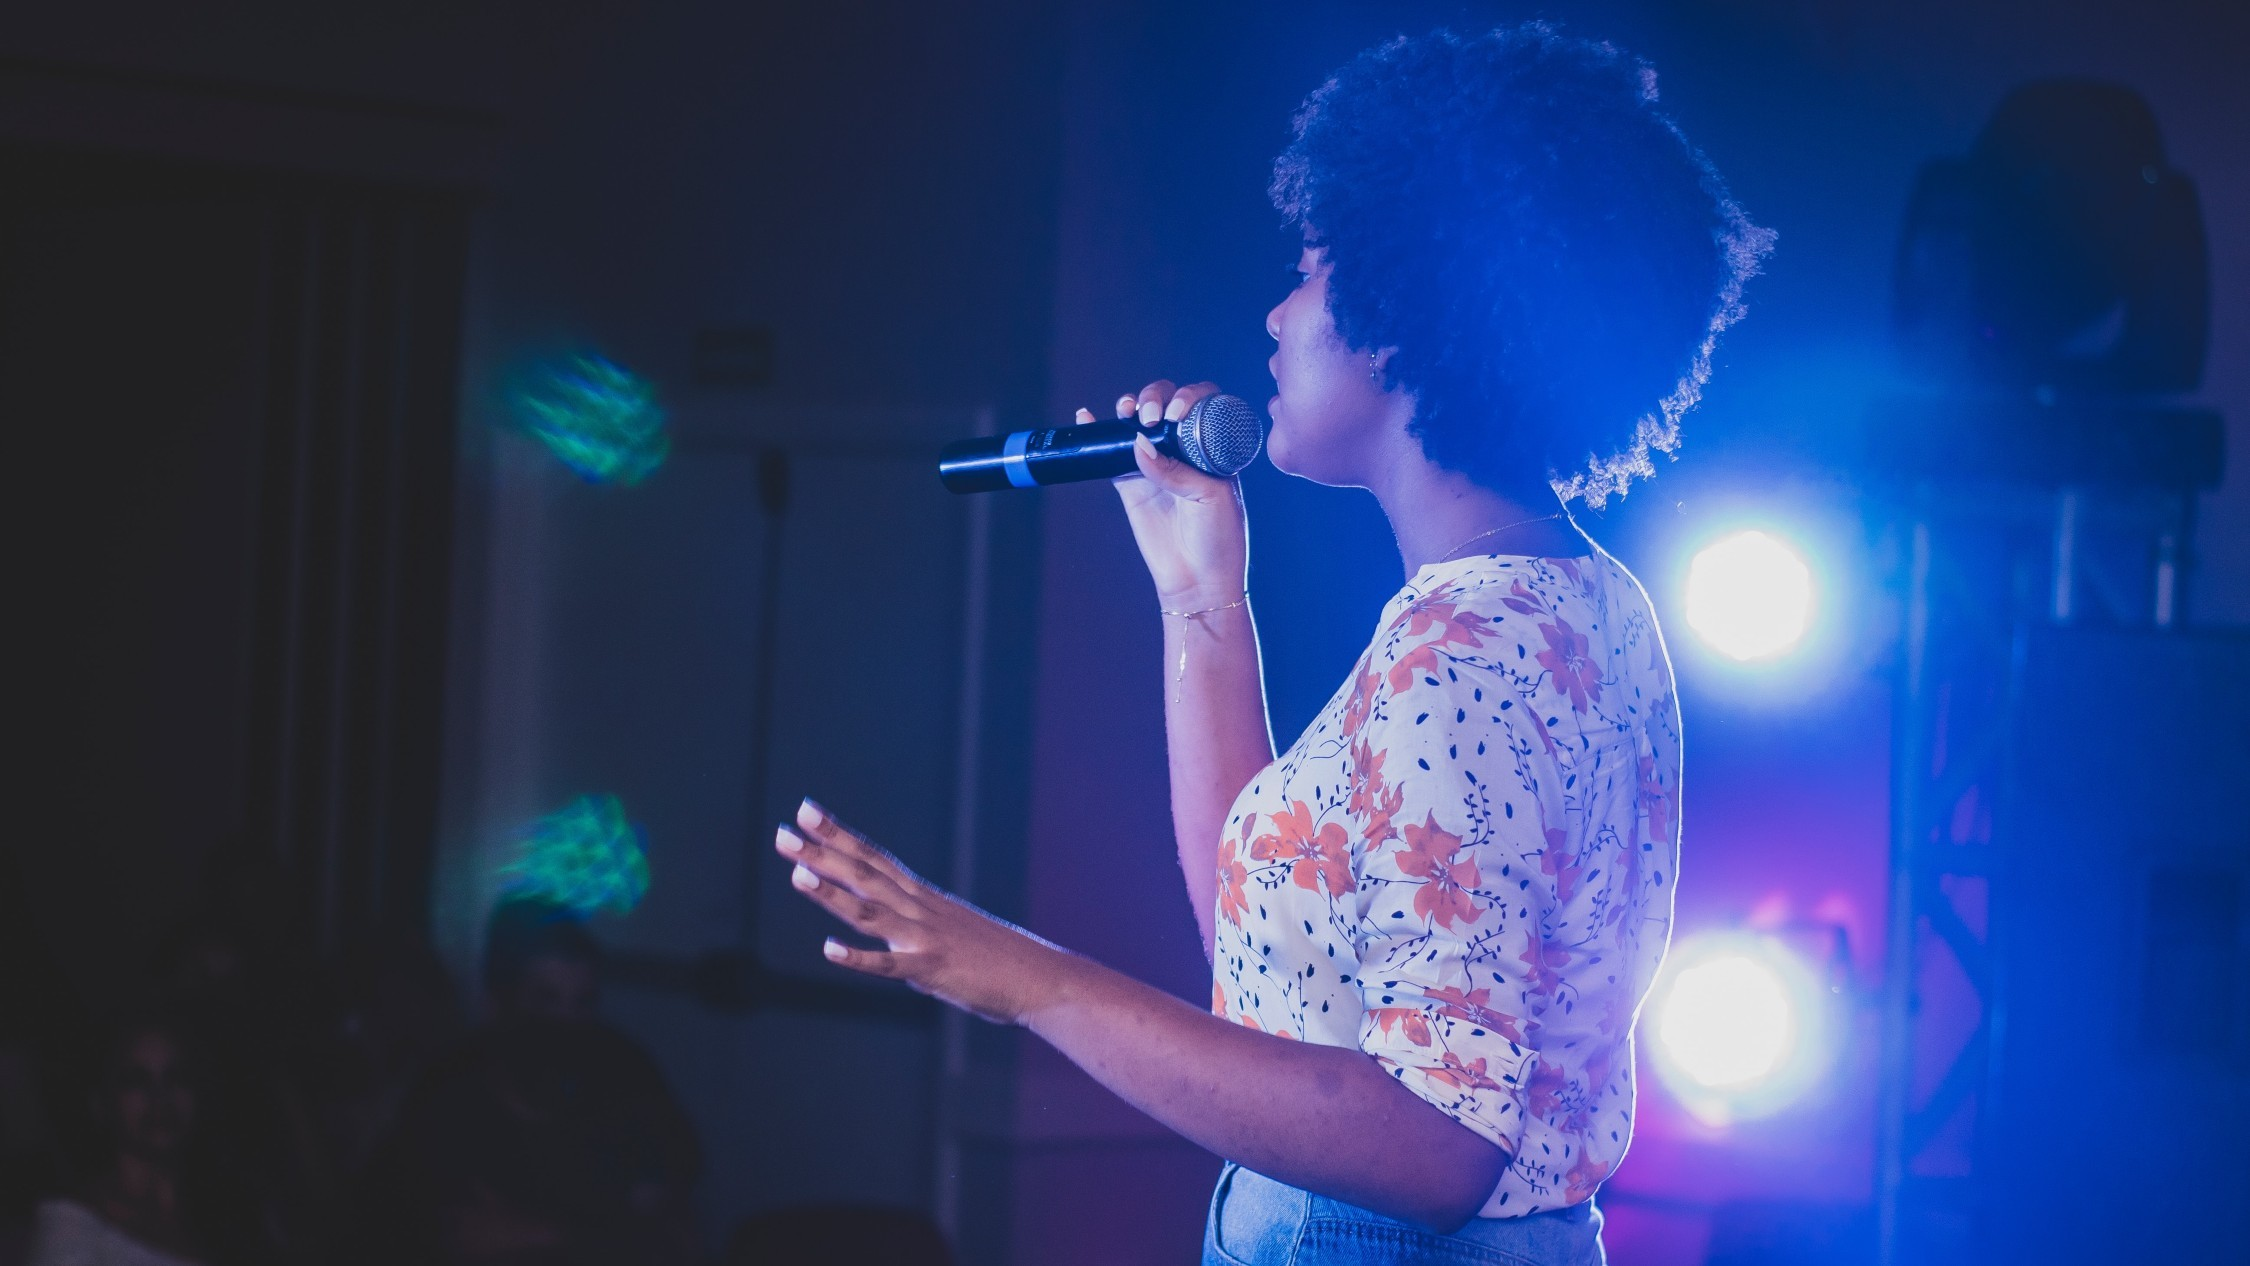 A woman singing karaoke on stage.